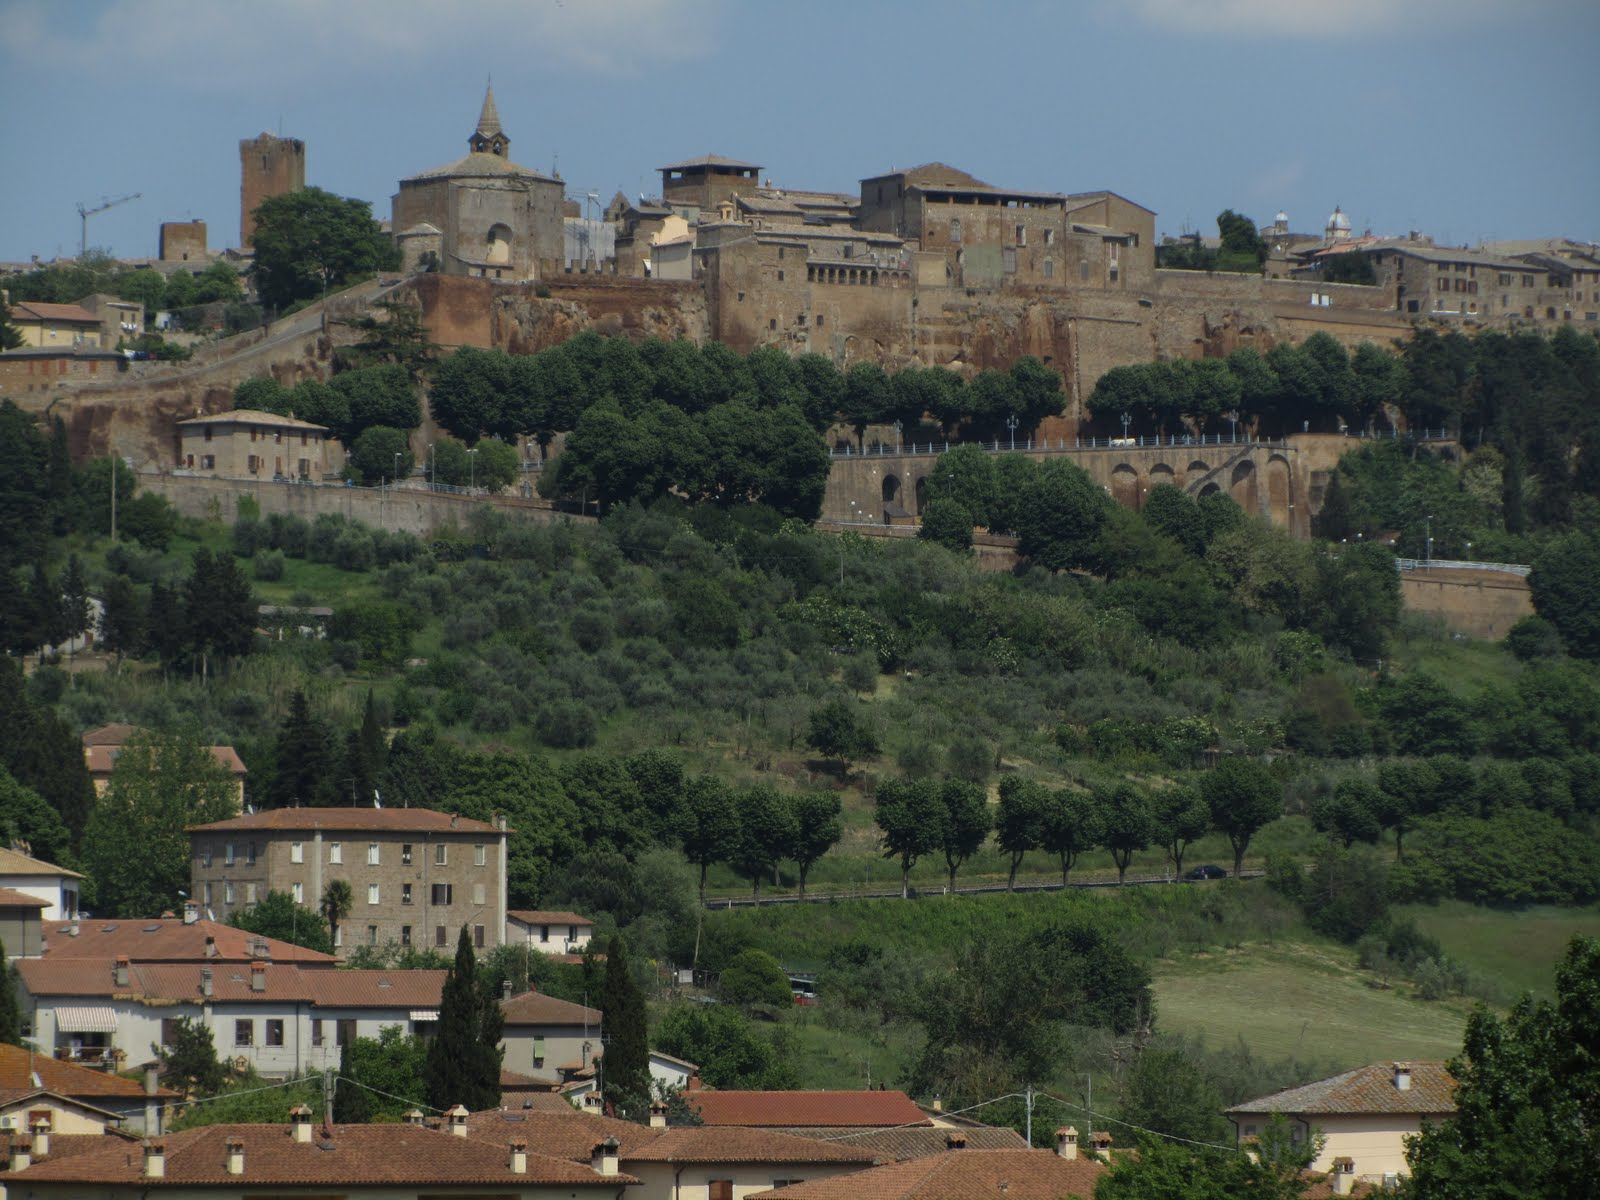 Orvieto Italy  city photos gallery : Orvieto Italy | Foto Artis Candydoll